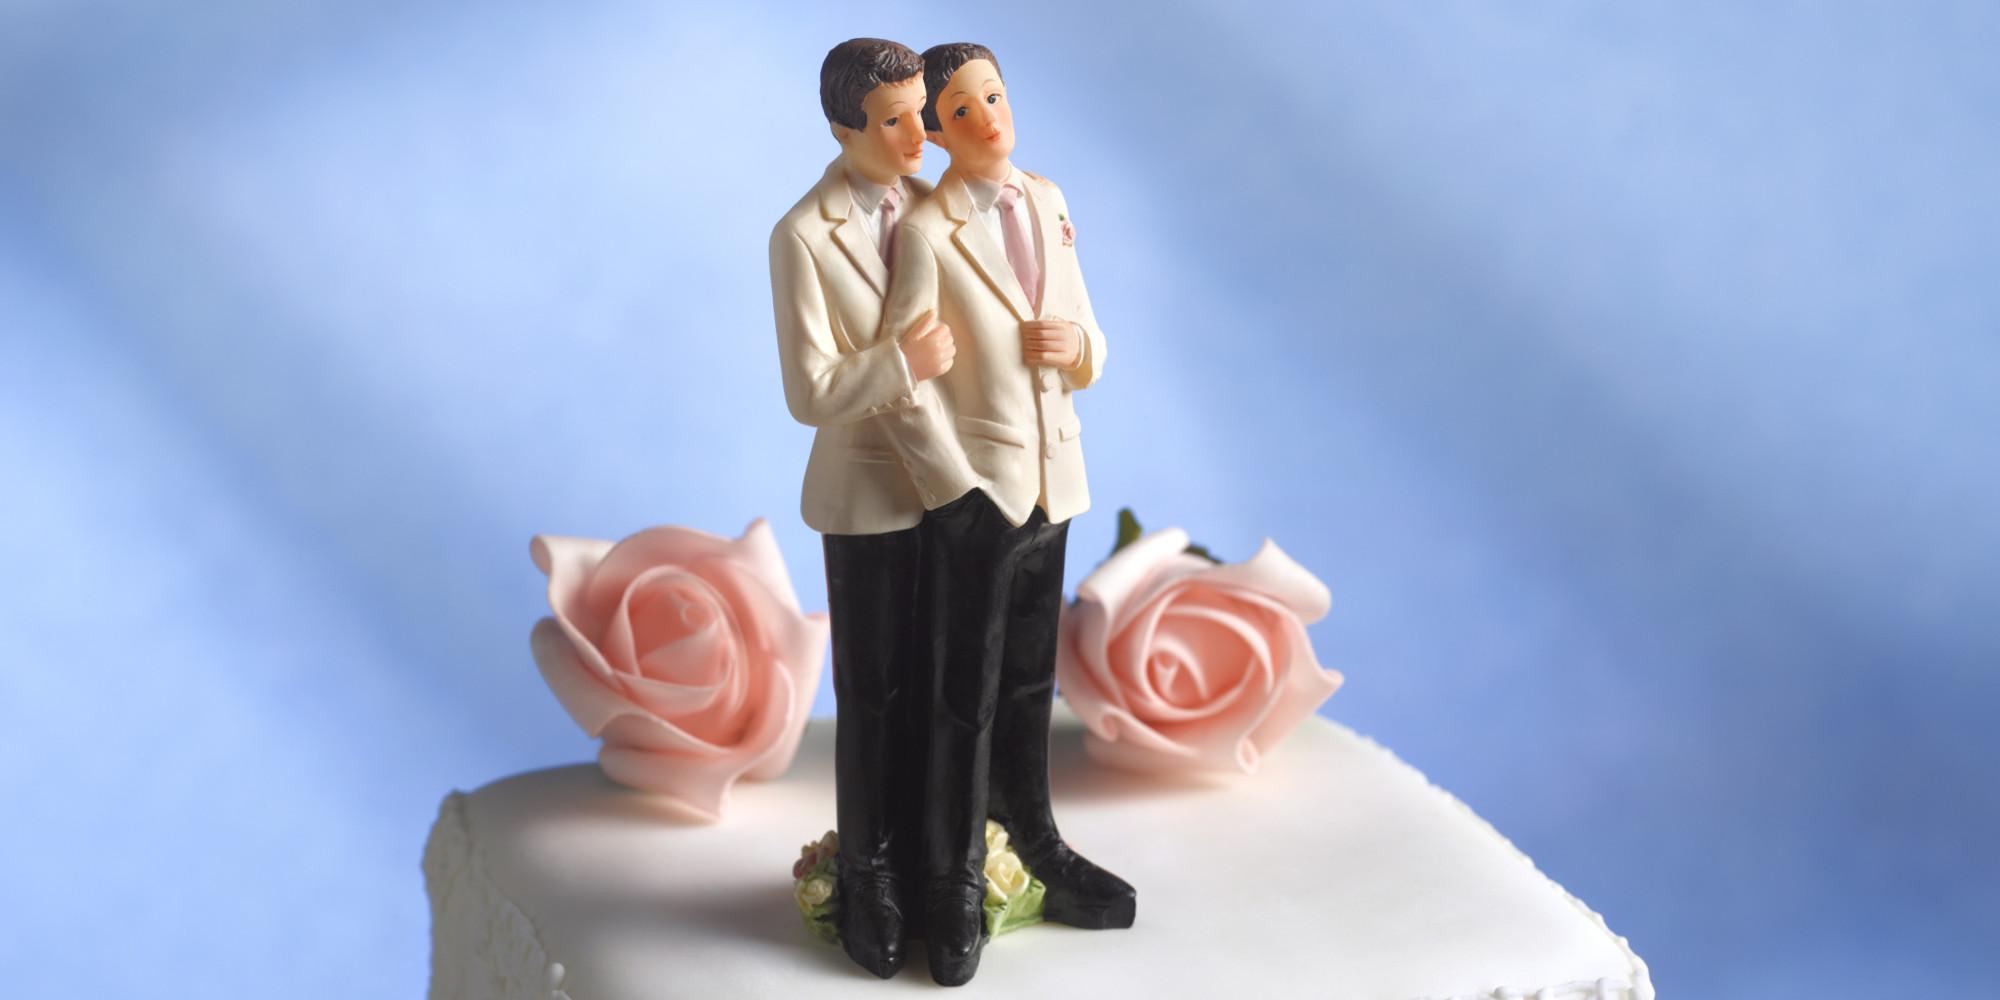 Gay male wedding figurines